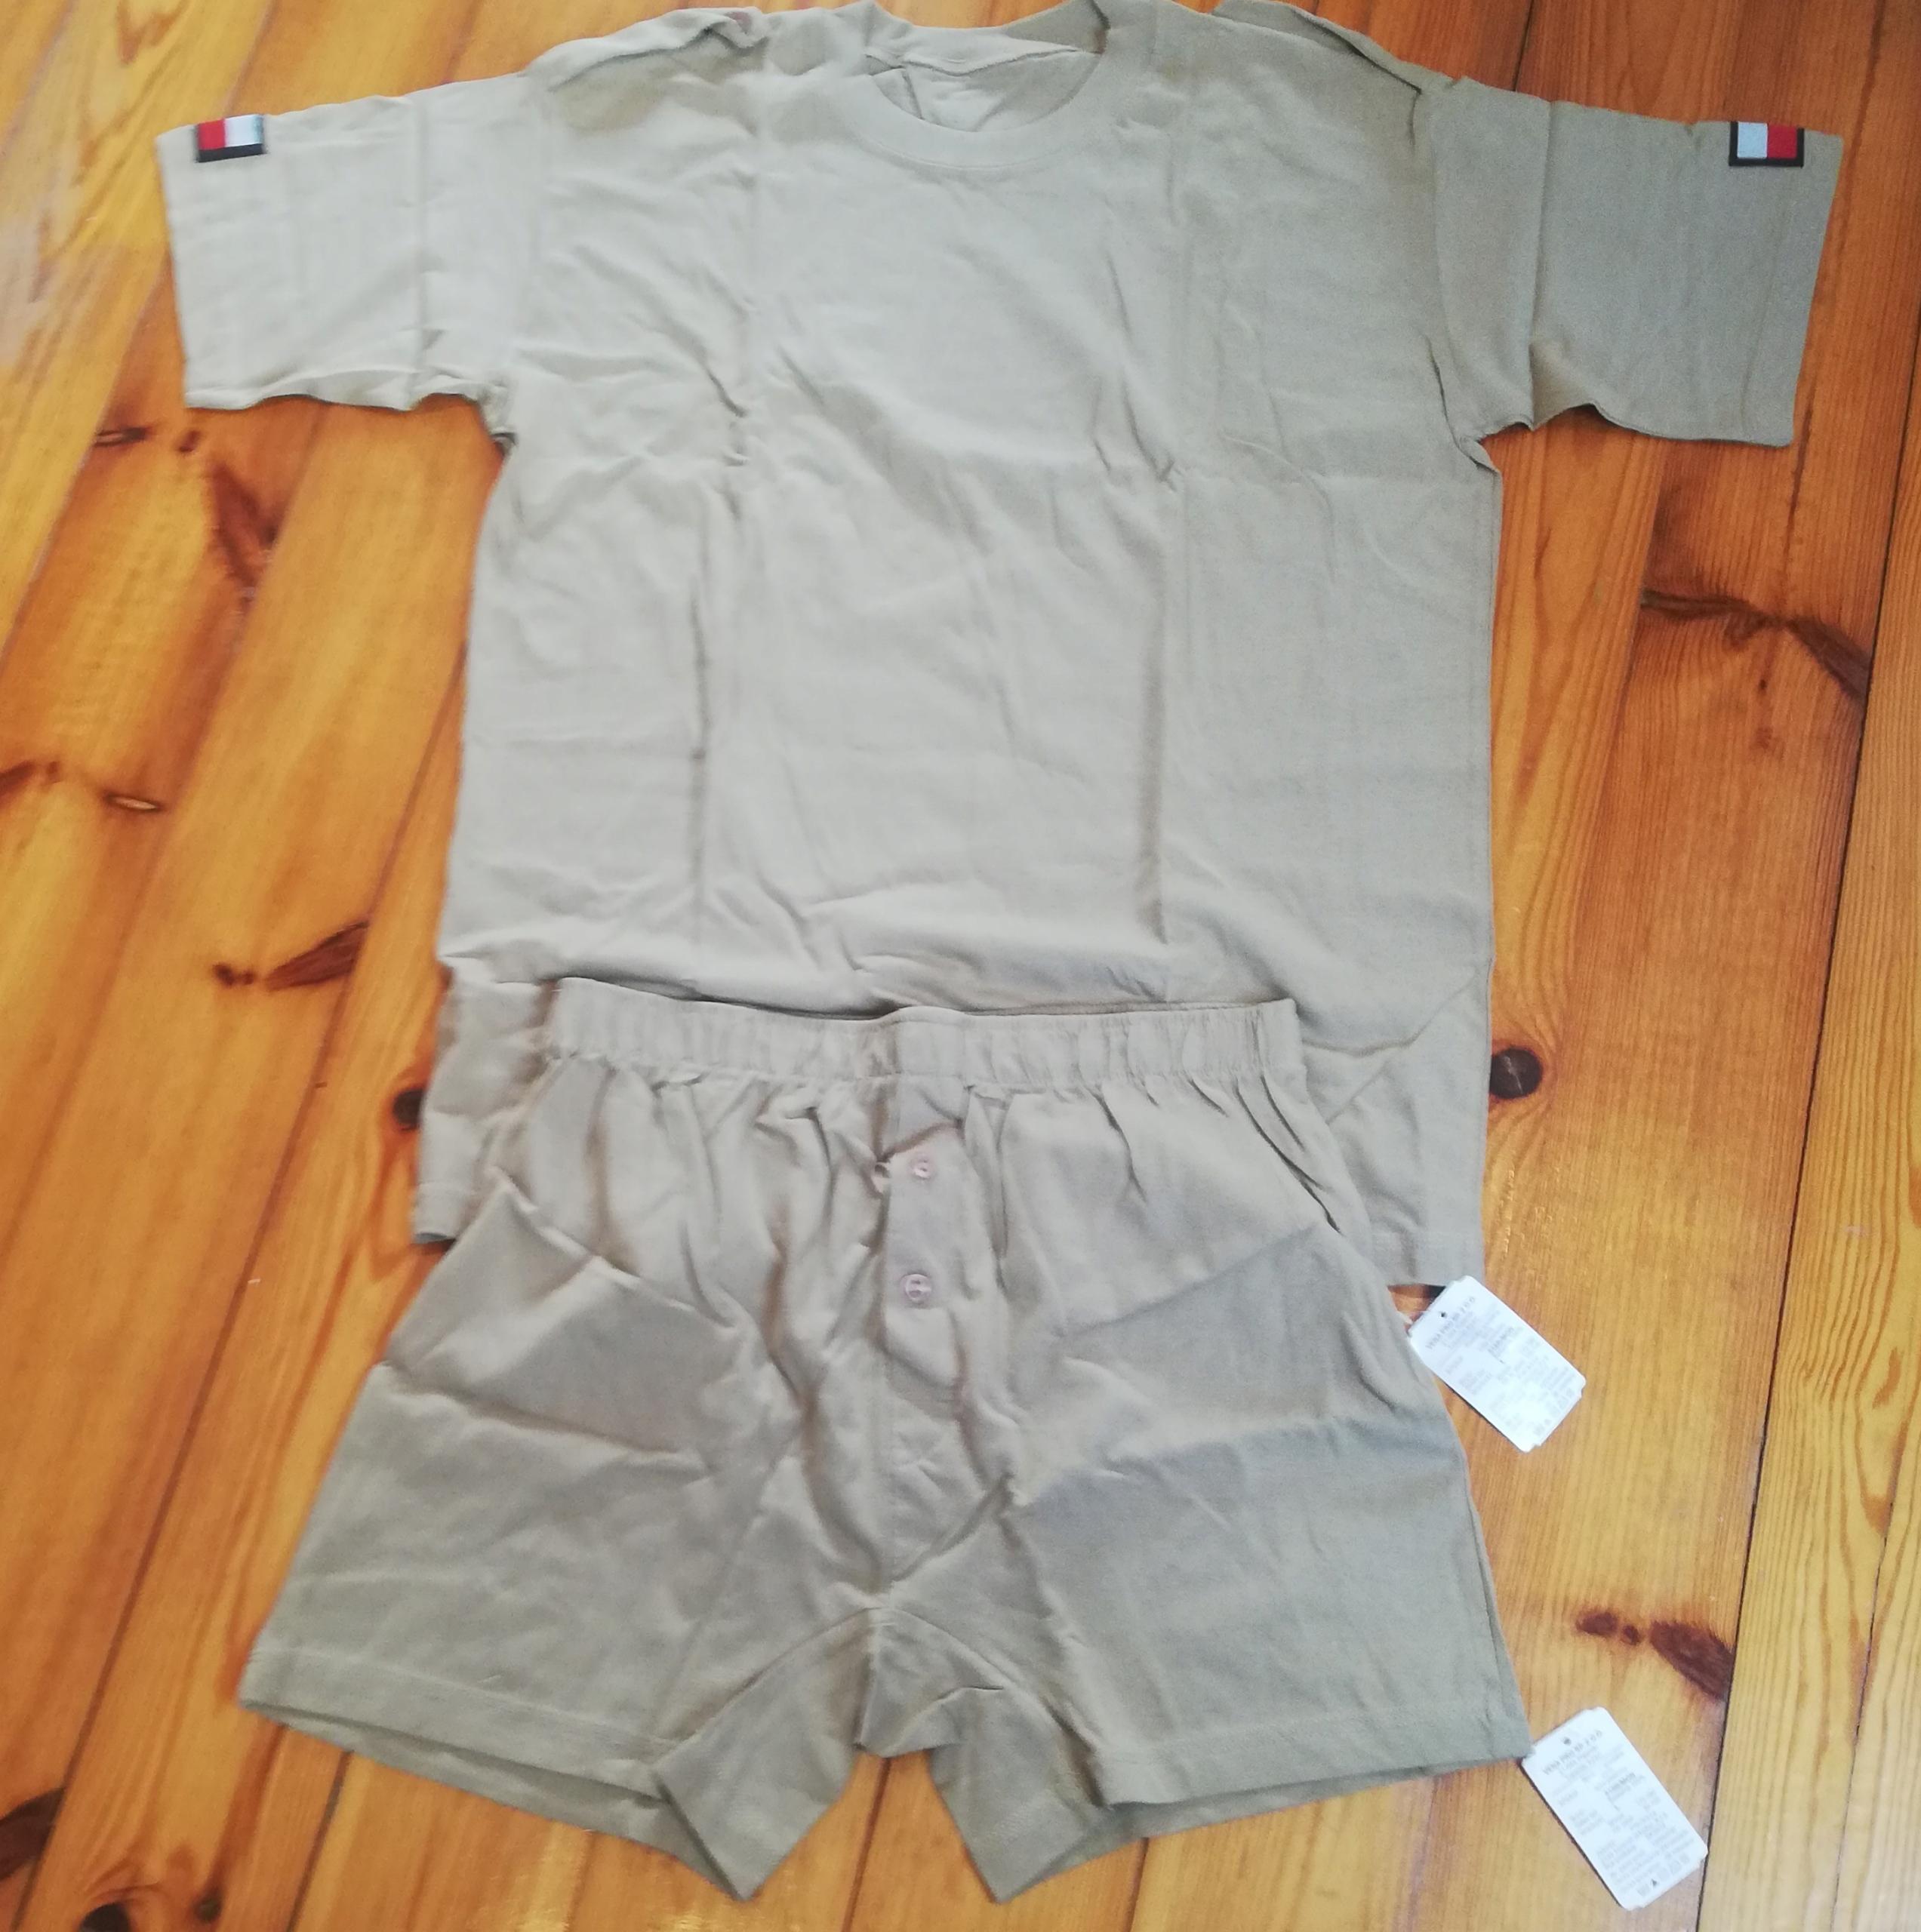 Koszulka i Spodenki wz 515&514B/MONrozmiar L